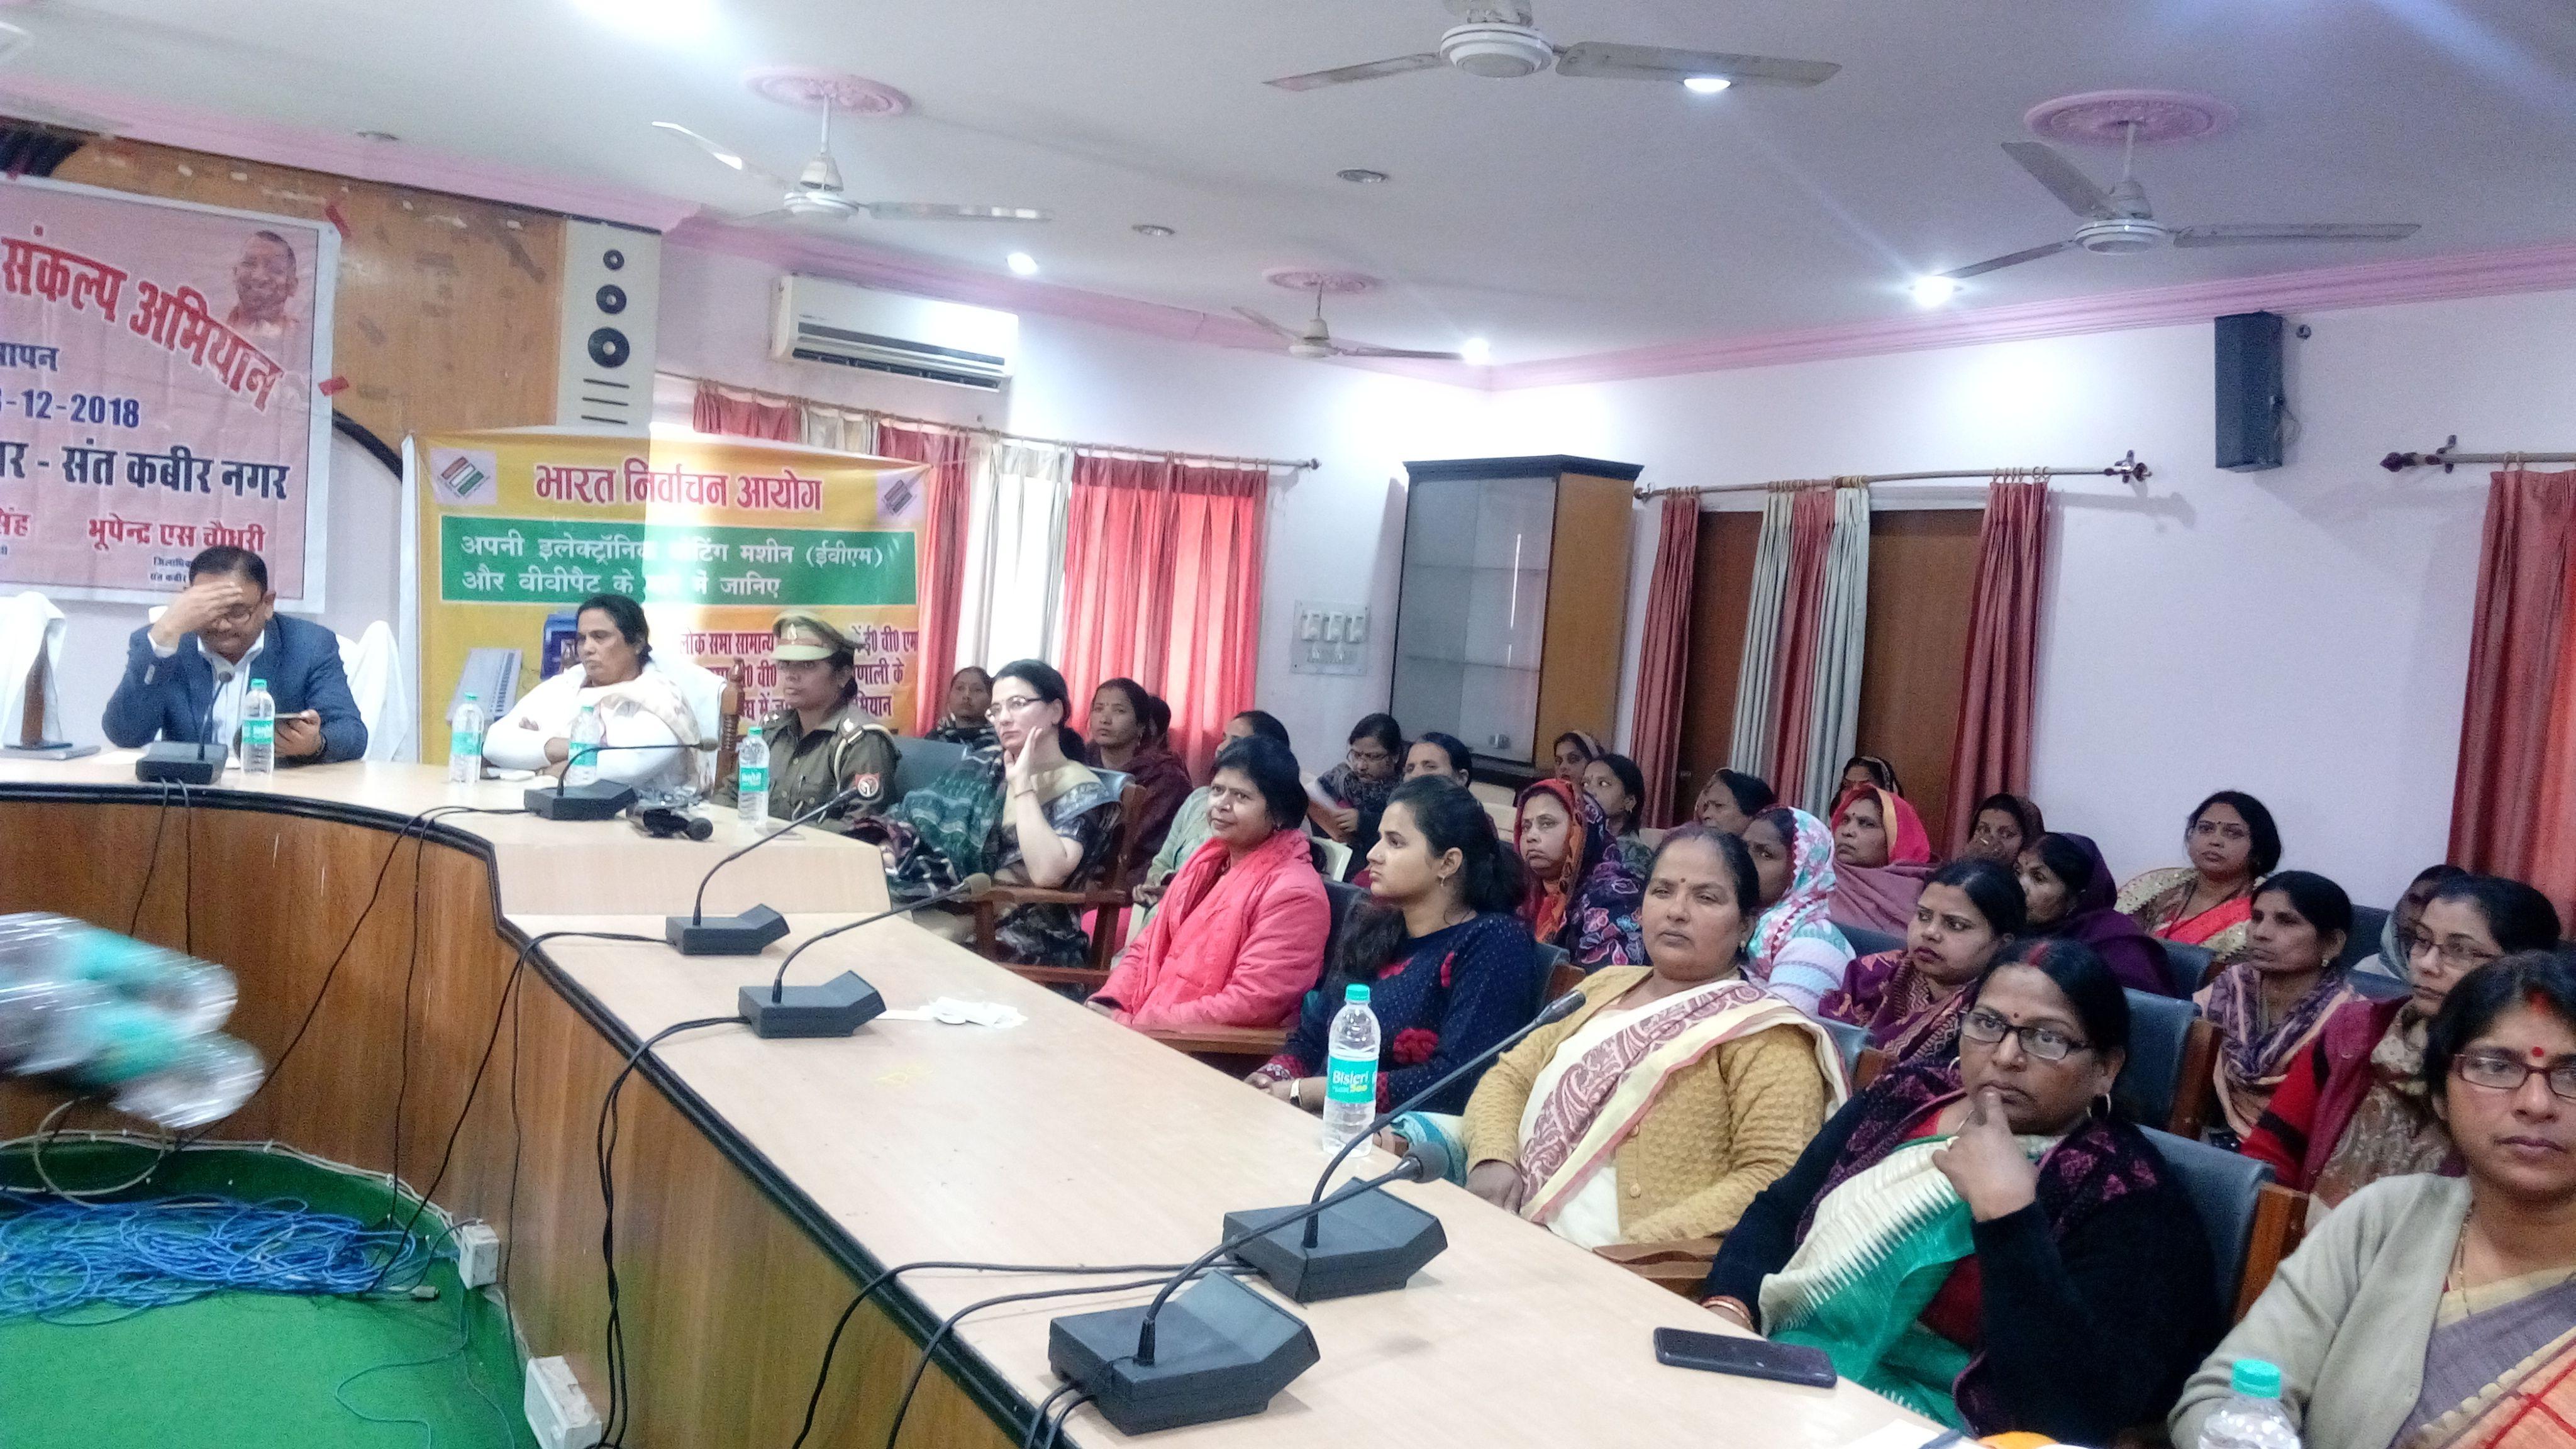 Training given by Master Trainer at Mahila Shasaktikaran Day